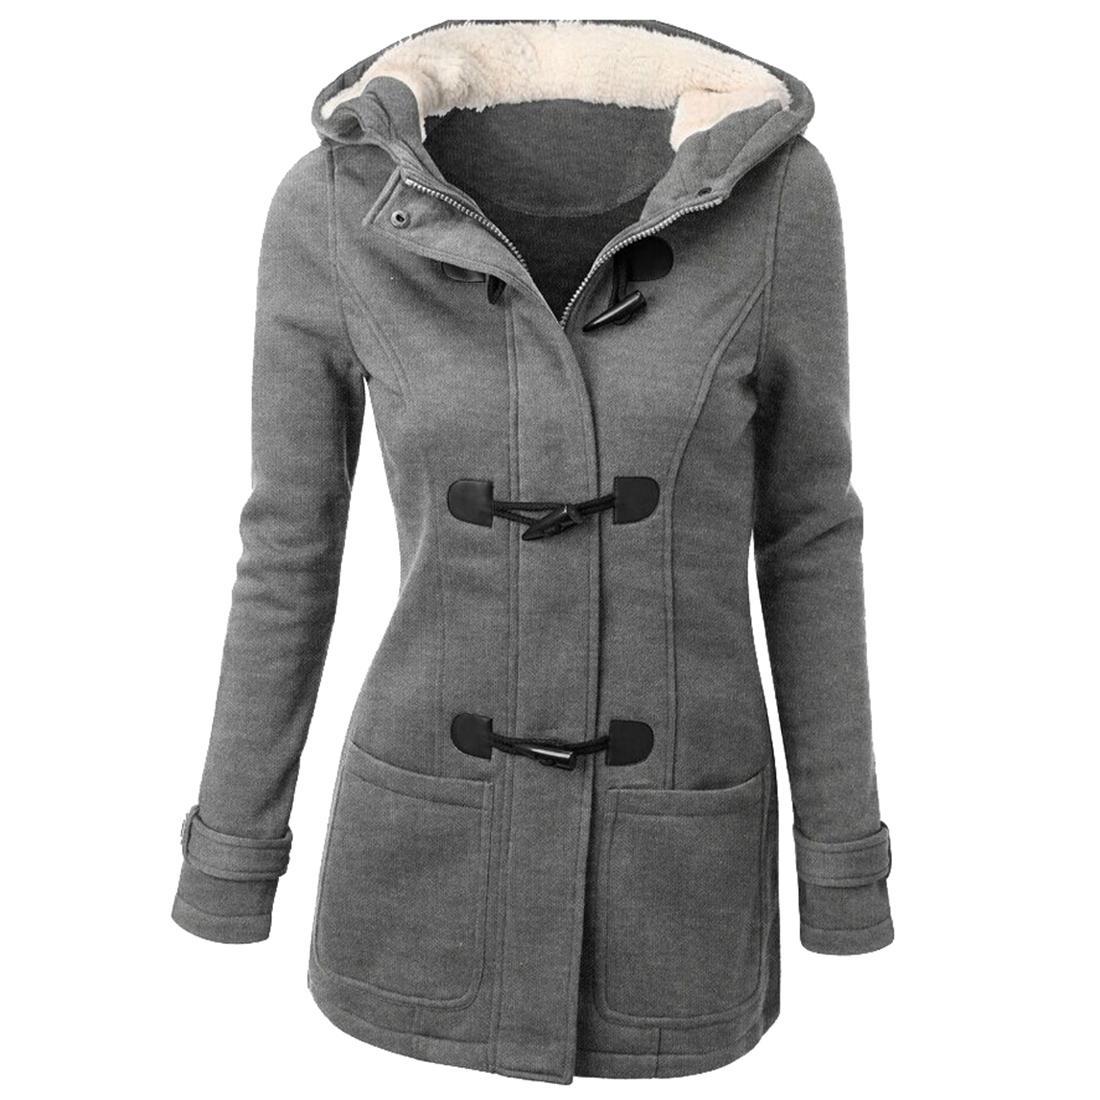 Mantel schwarz damen fruhling